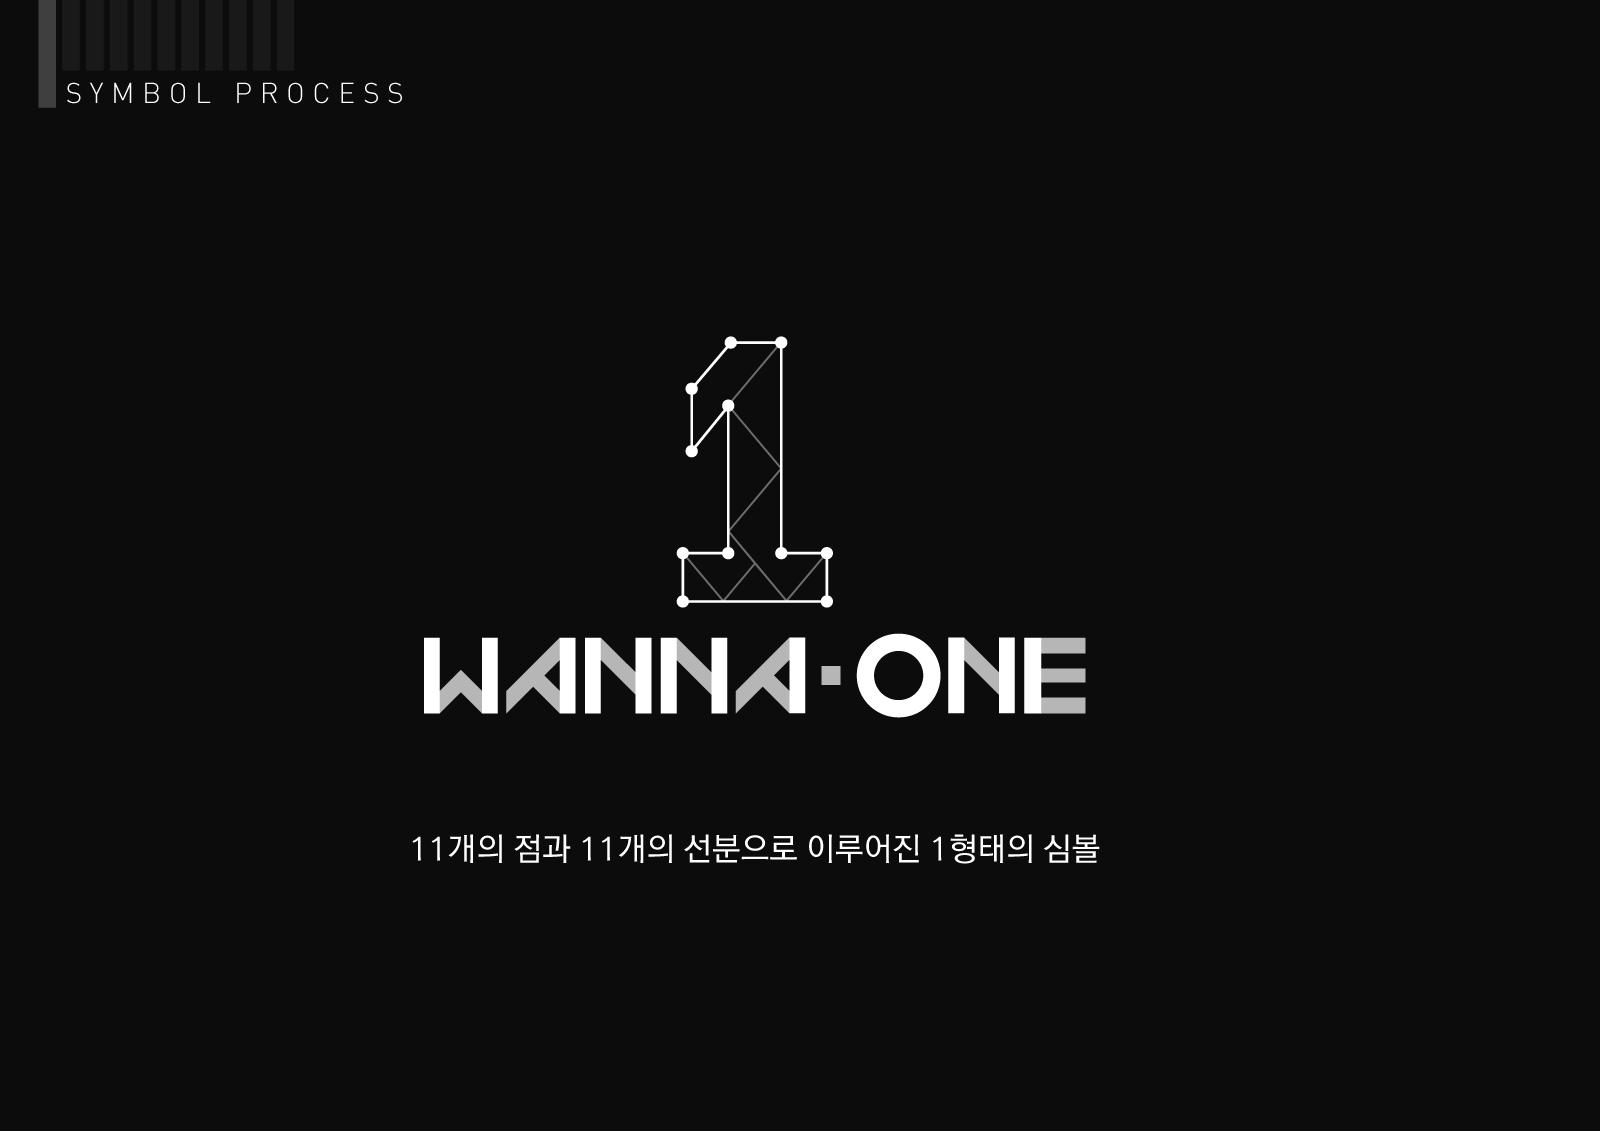 2017 WannaOne Logo Branding (워너원 로고 및 컨셉 브랜딩) on Behance.